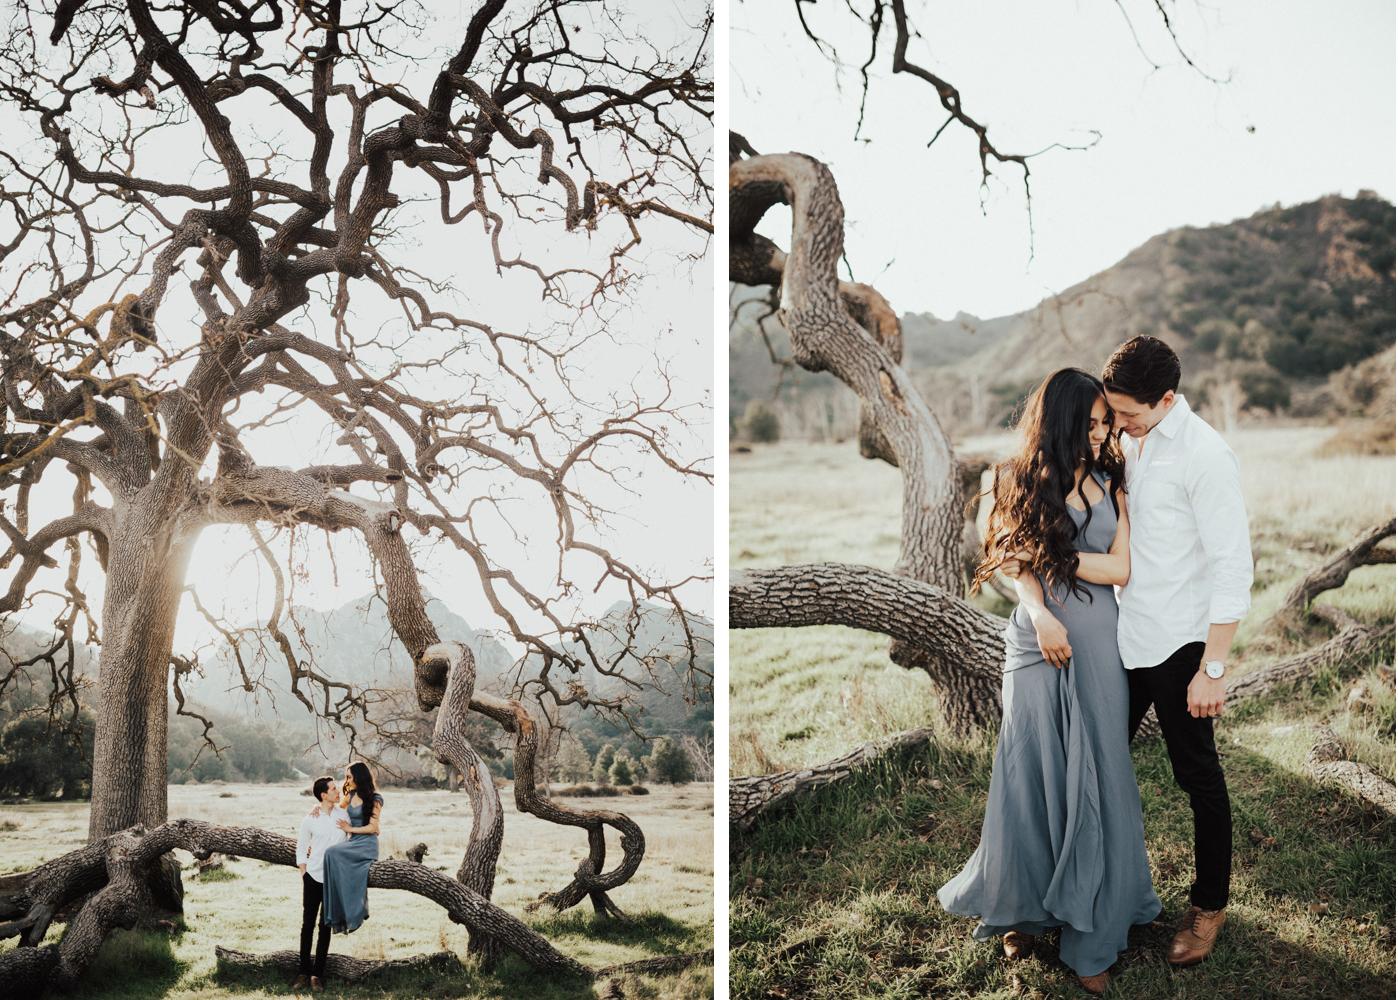 california los angeles wedding photographer kinsey mhire malibu phorography engagement-32.jpg